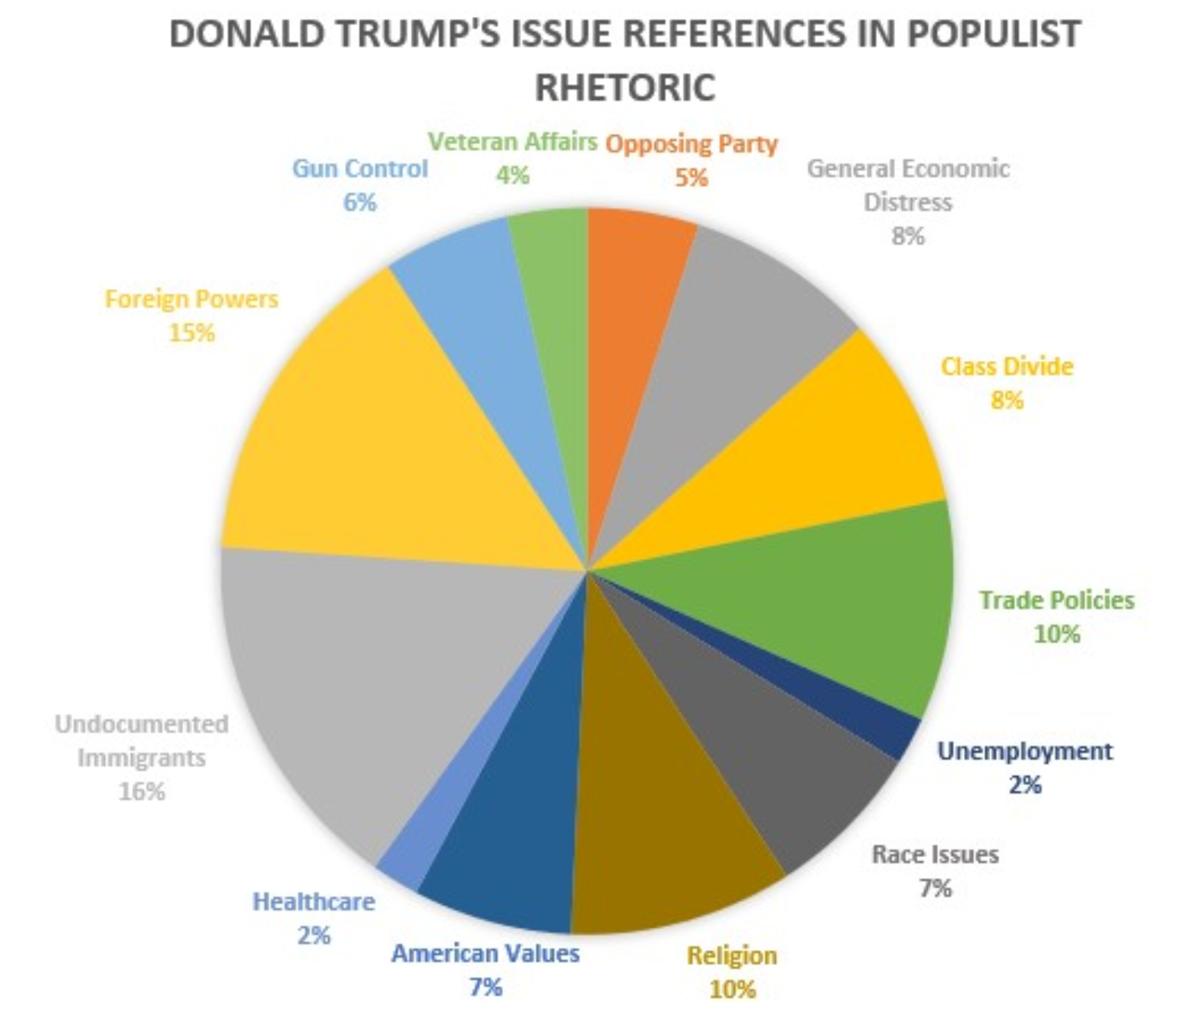 Trump favorite issues